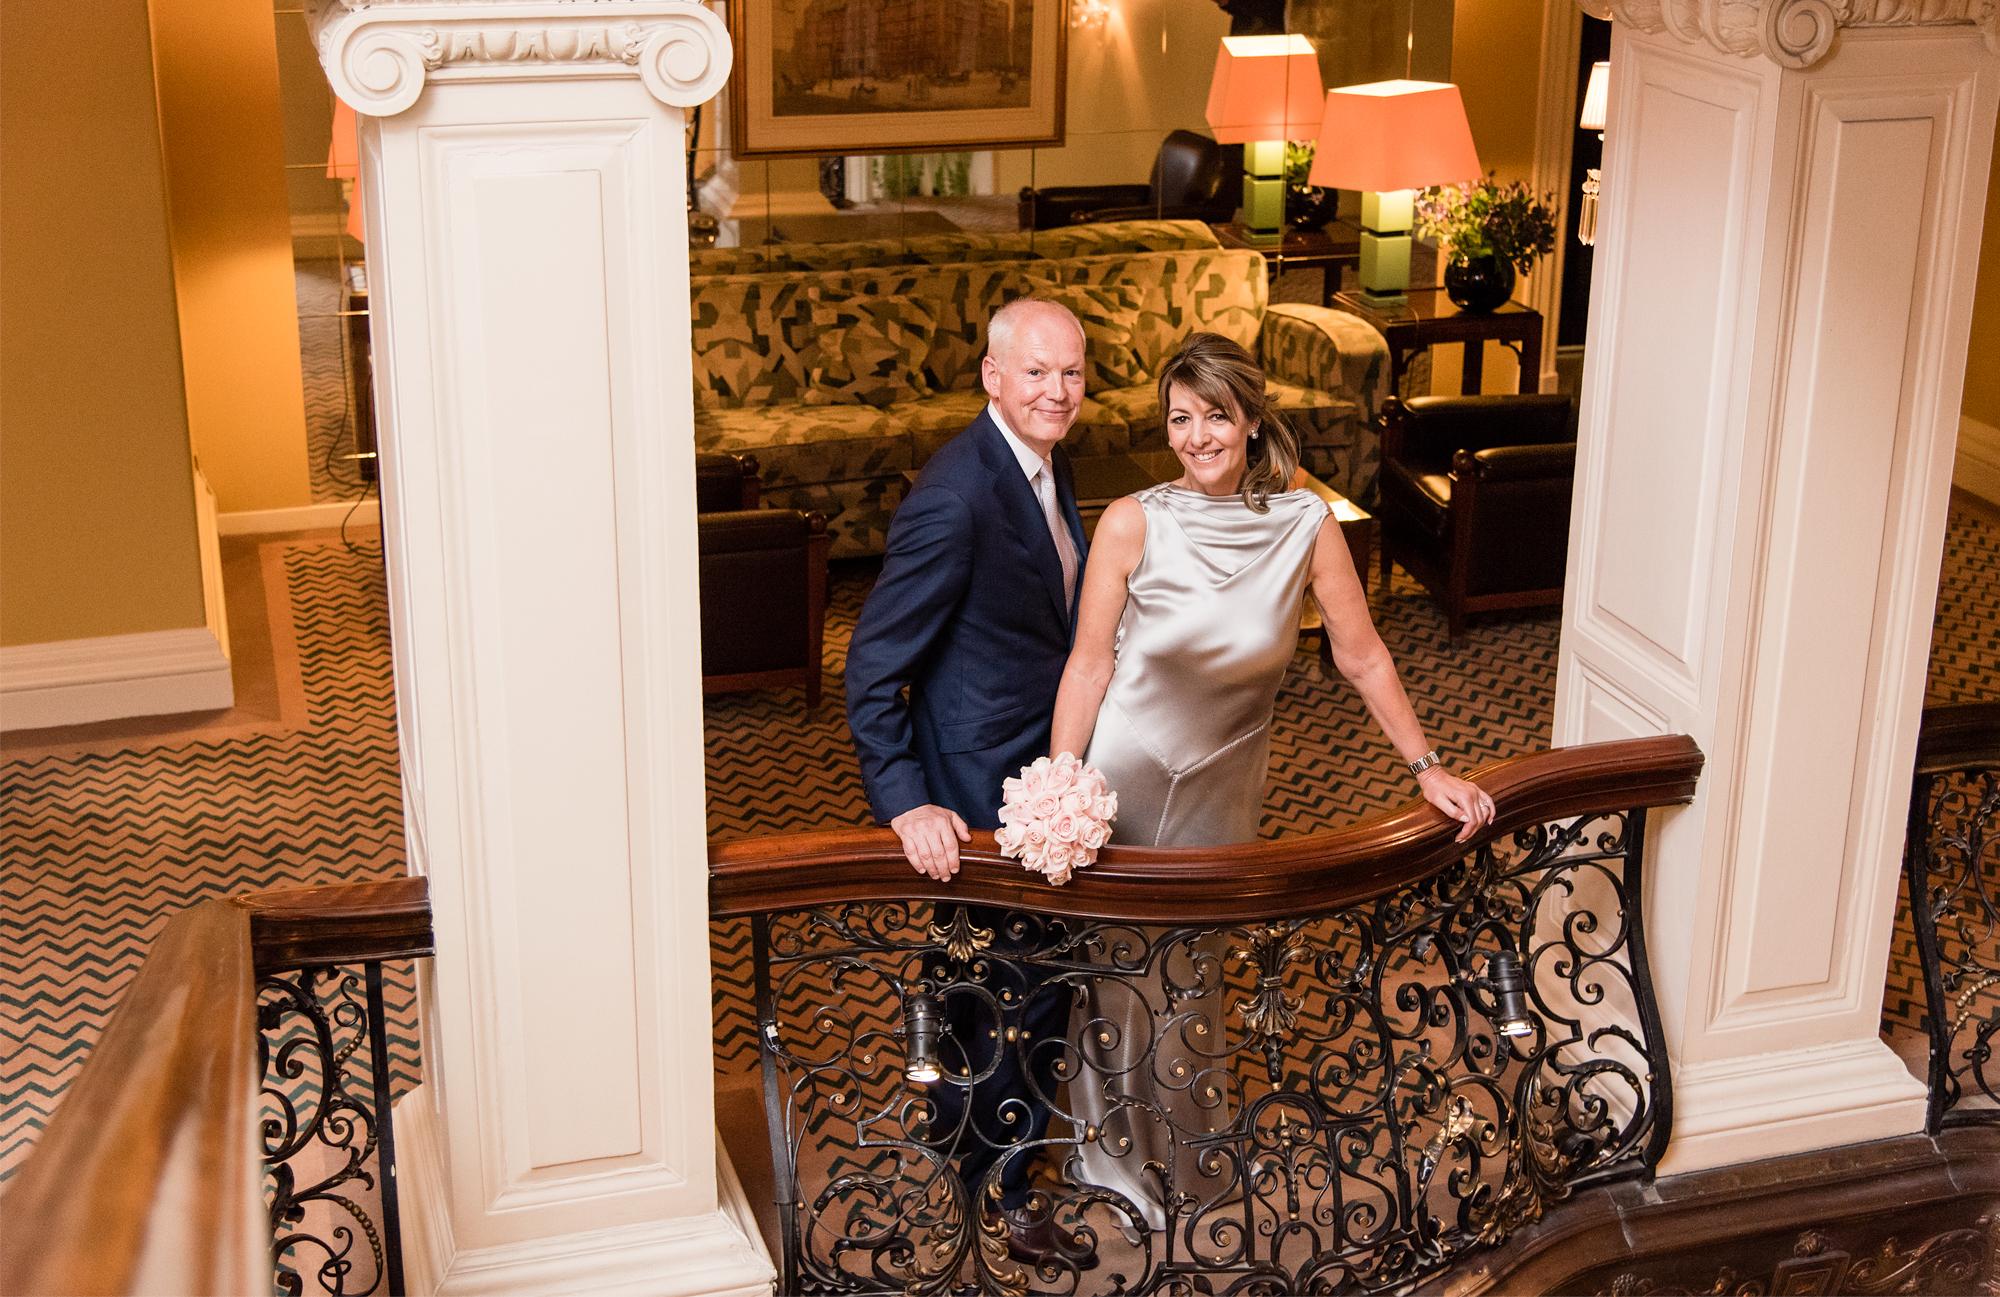 claridges wedding balcony bride and groom